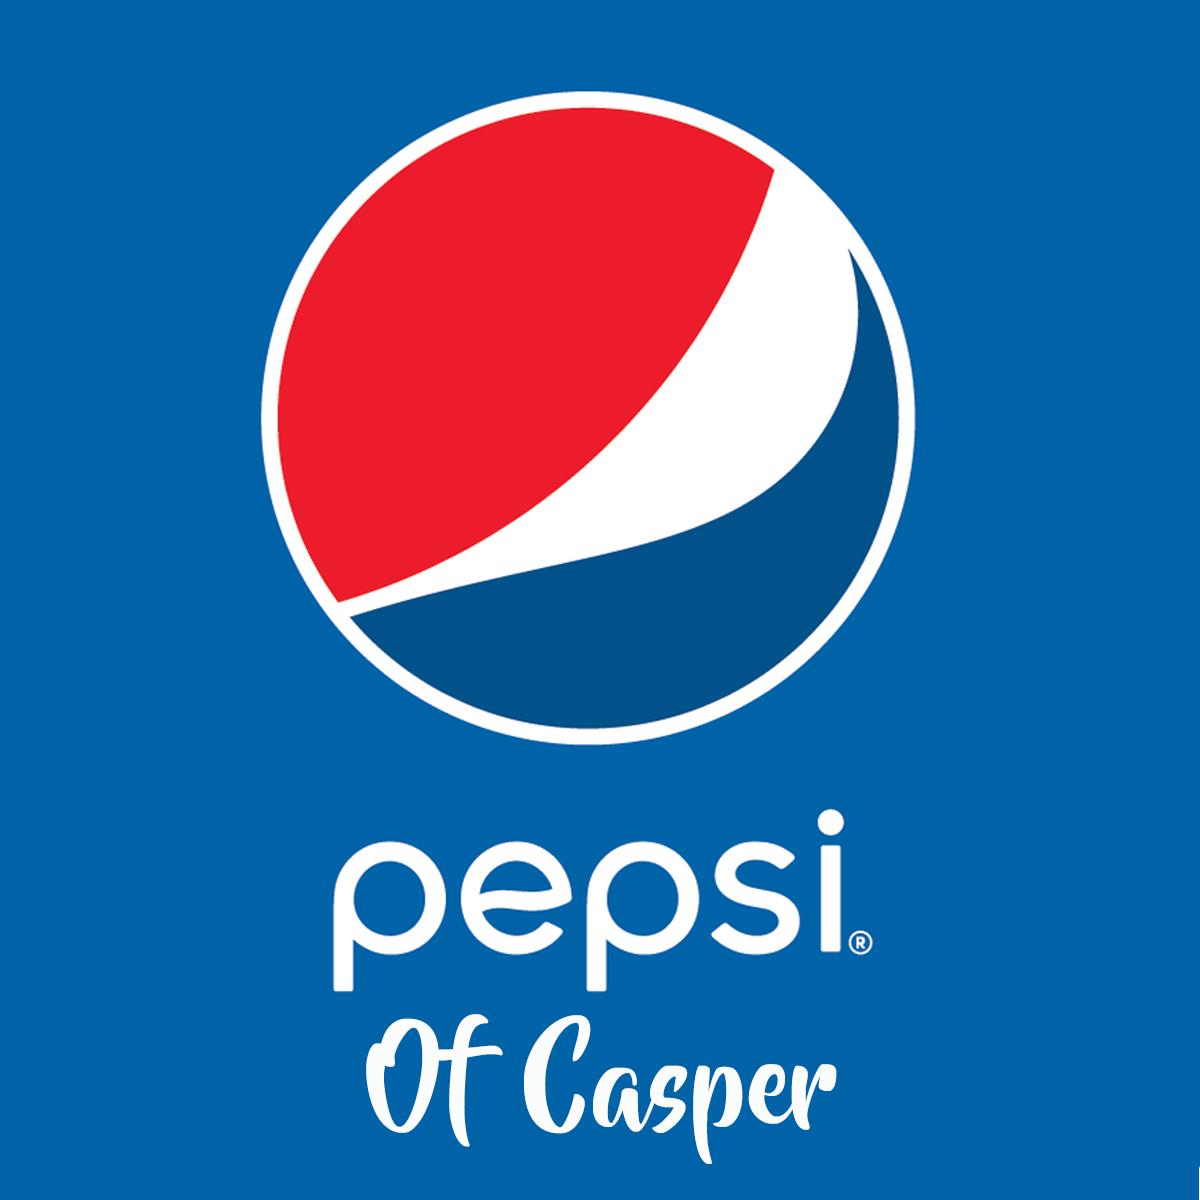 new pepsi logo 4x4 square.jpg